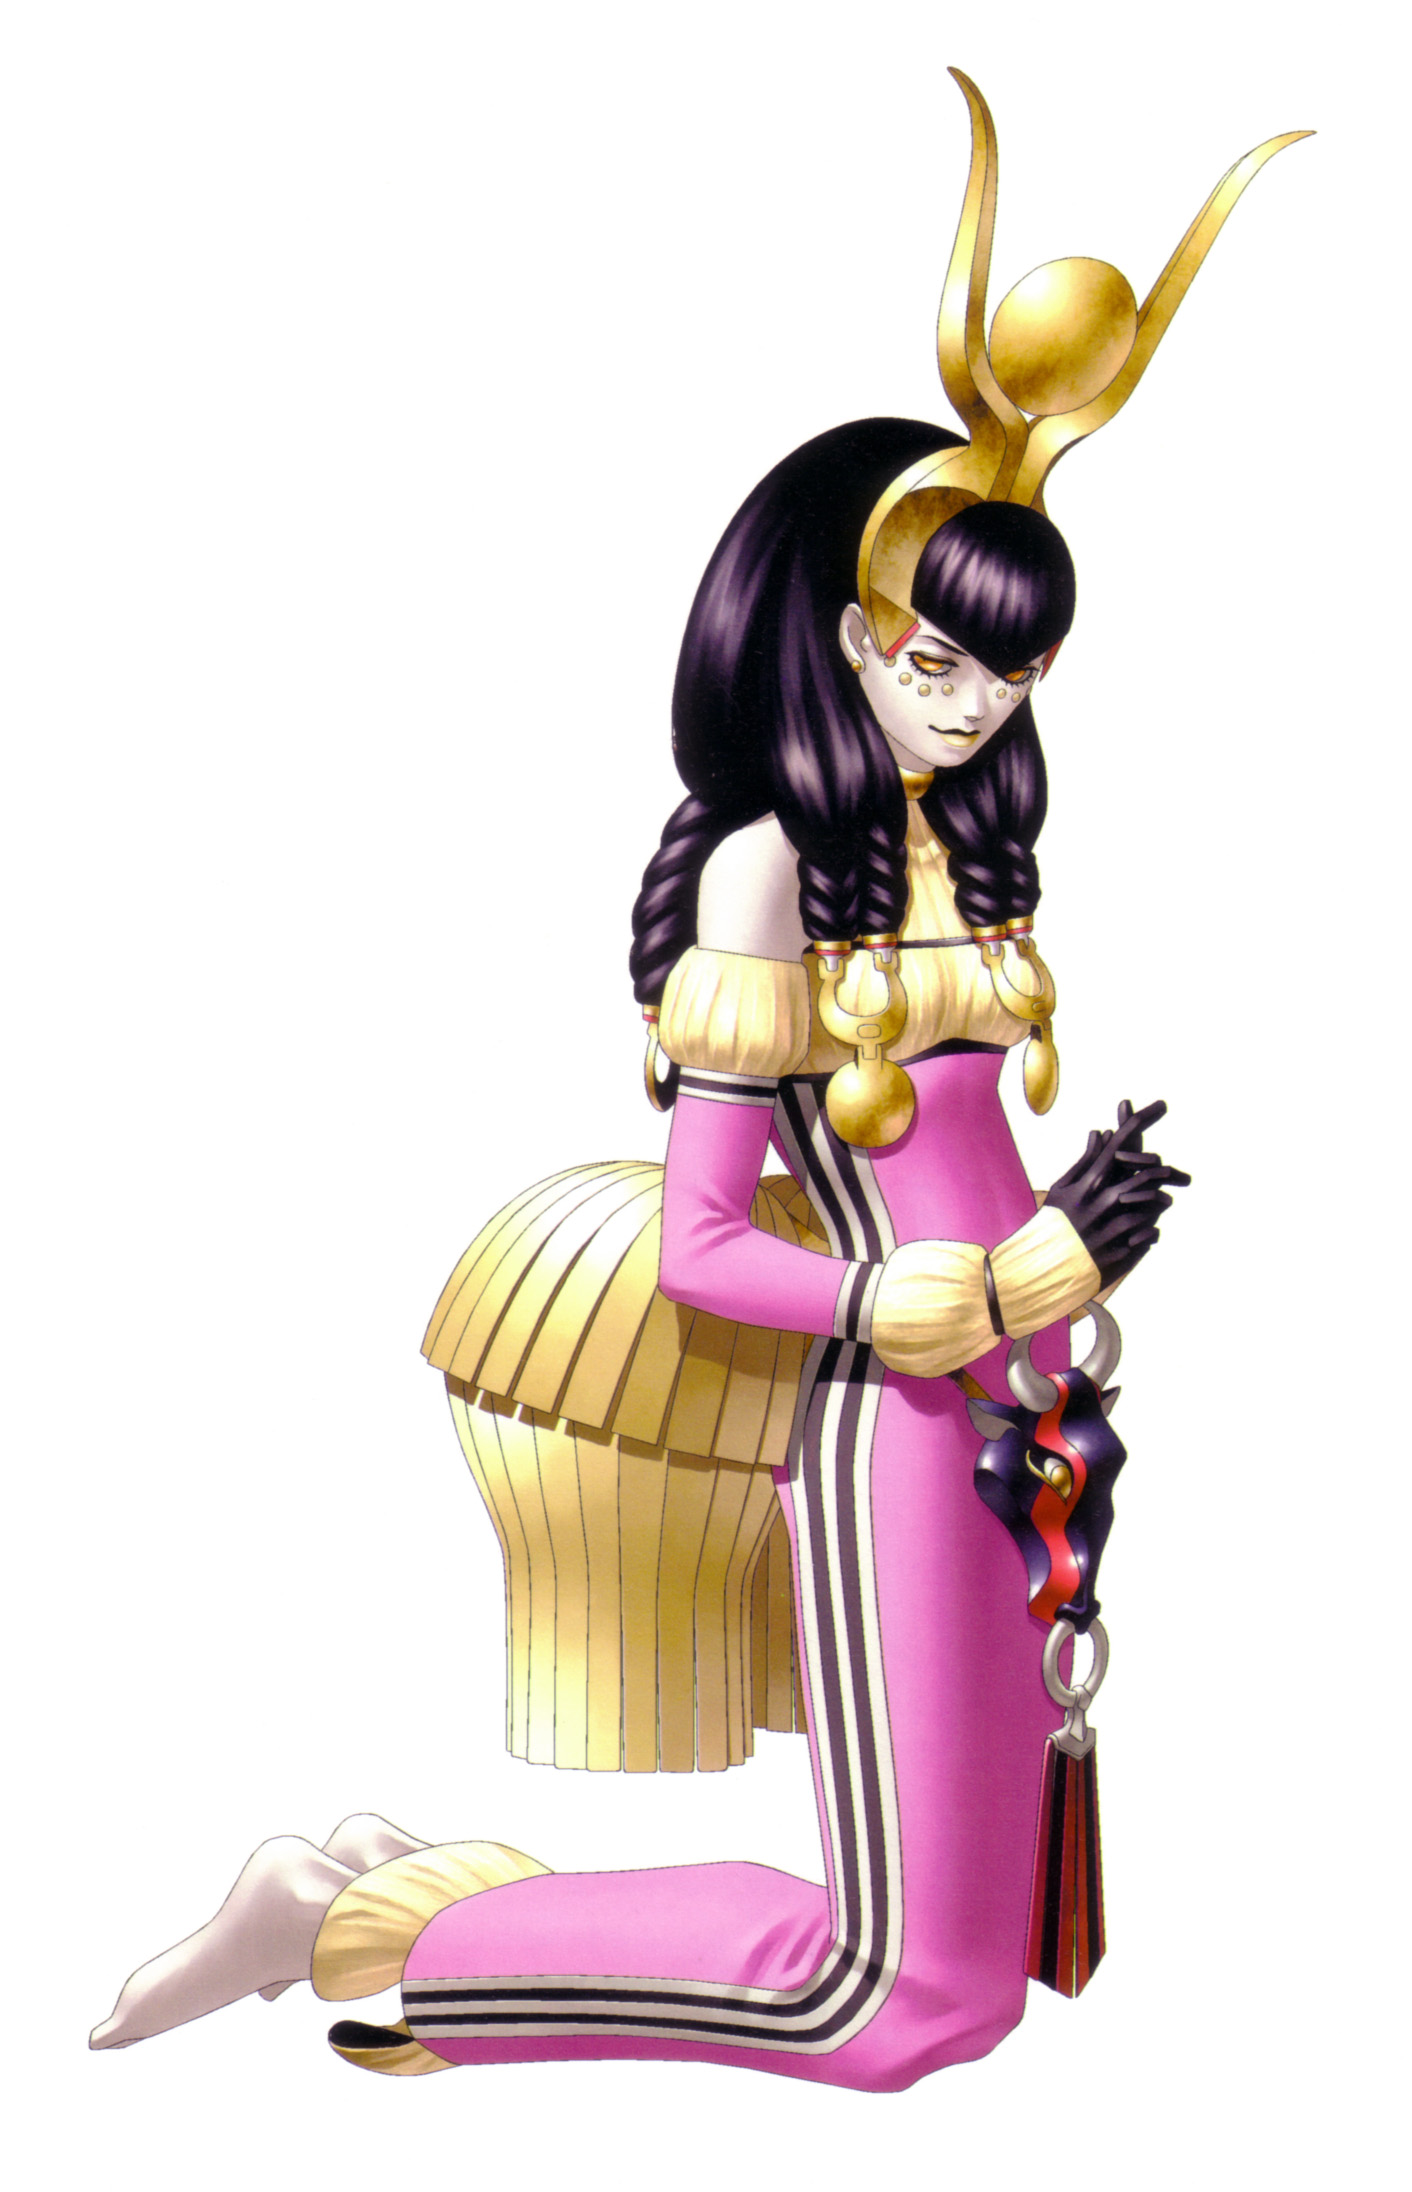 Hathor Megami Tensei Wiki A Demonic Compendium Of Your True Self